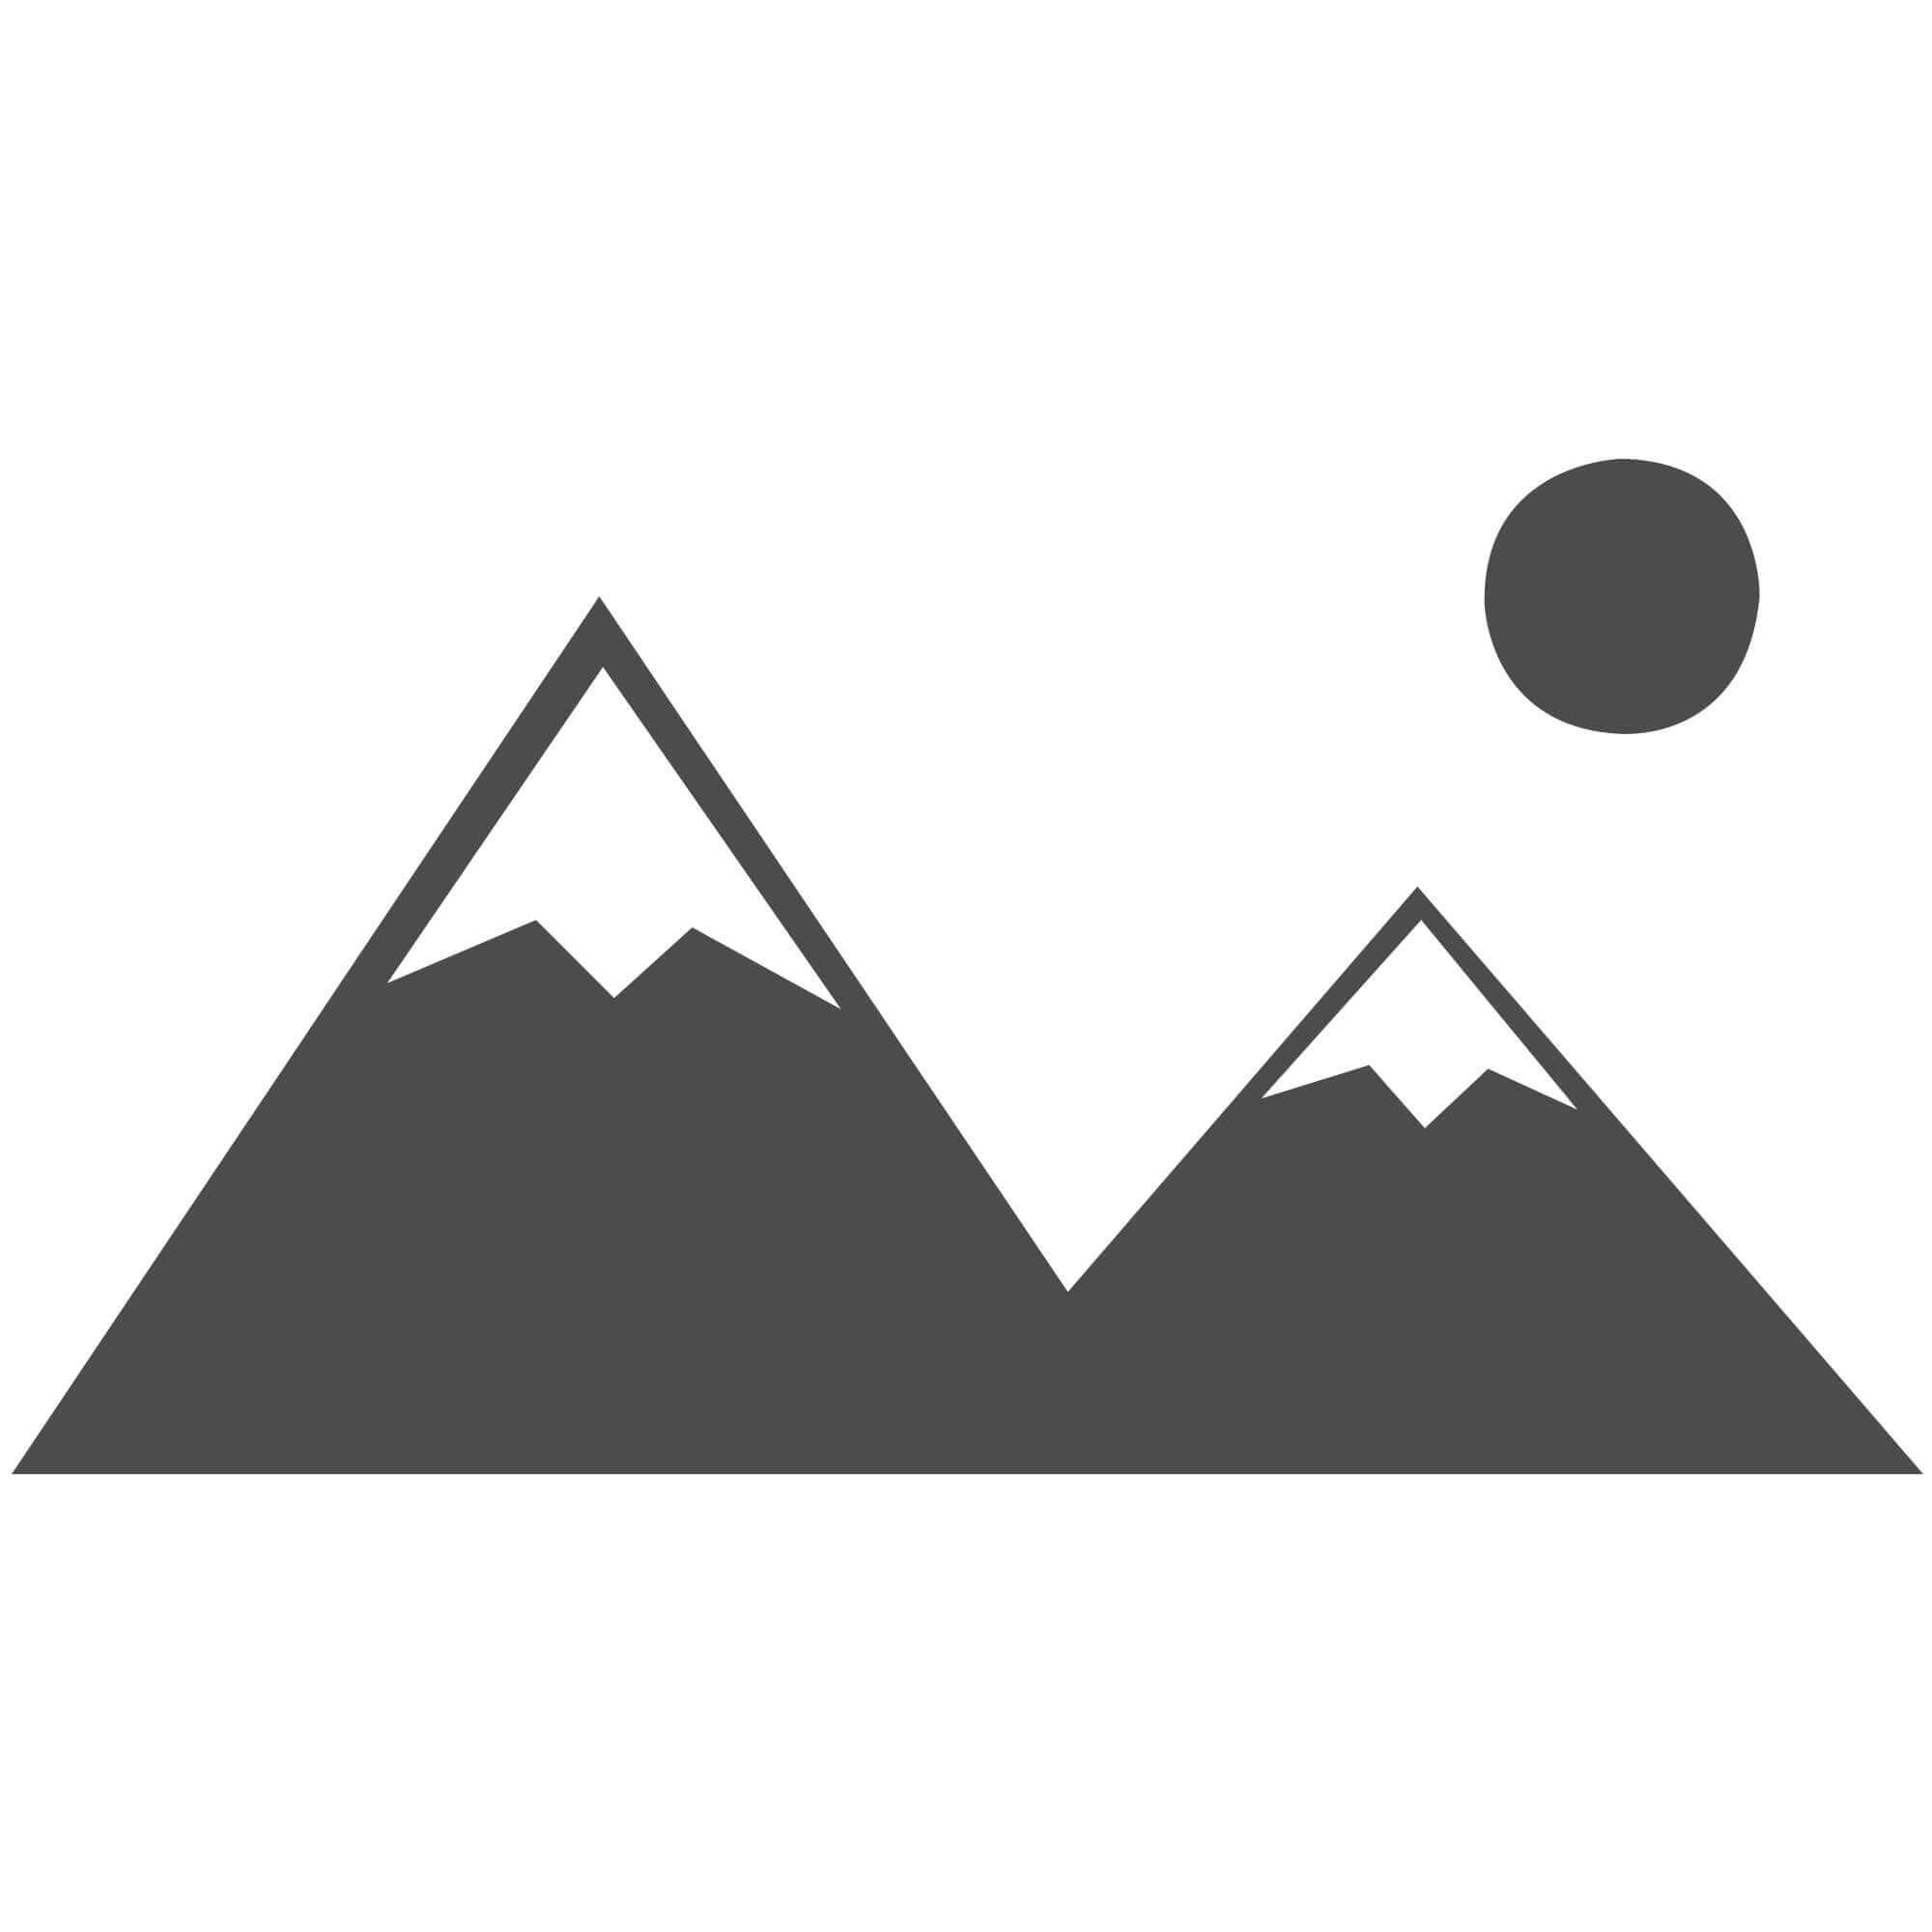 "Shatter Rug - Beige Brown - Size 120 x 170 cm (4' x 5'7"")"